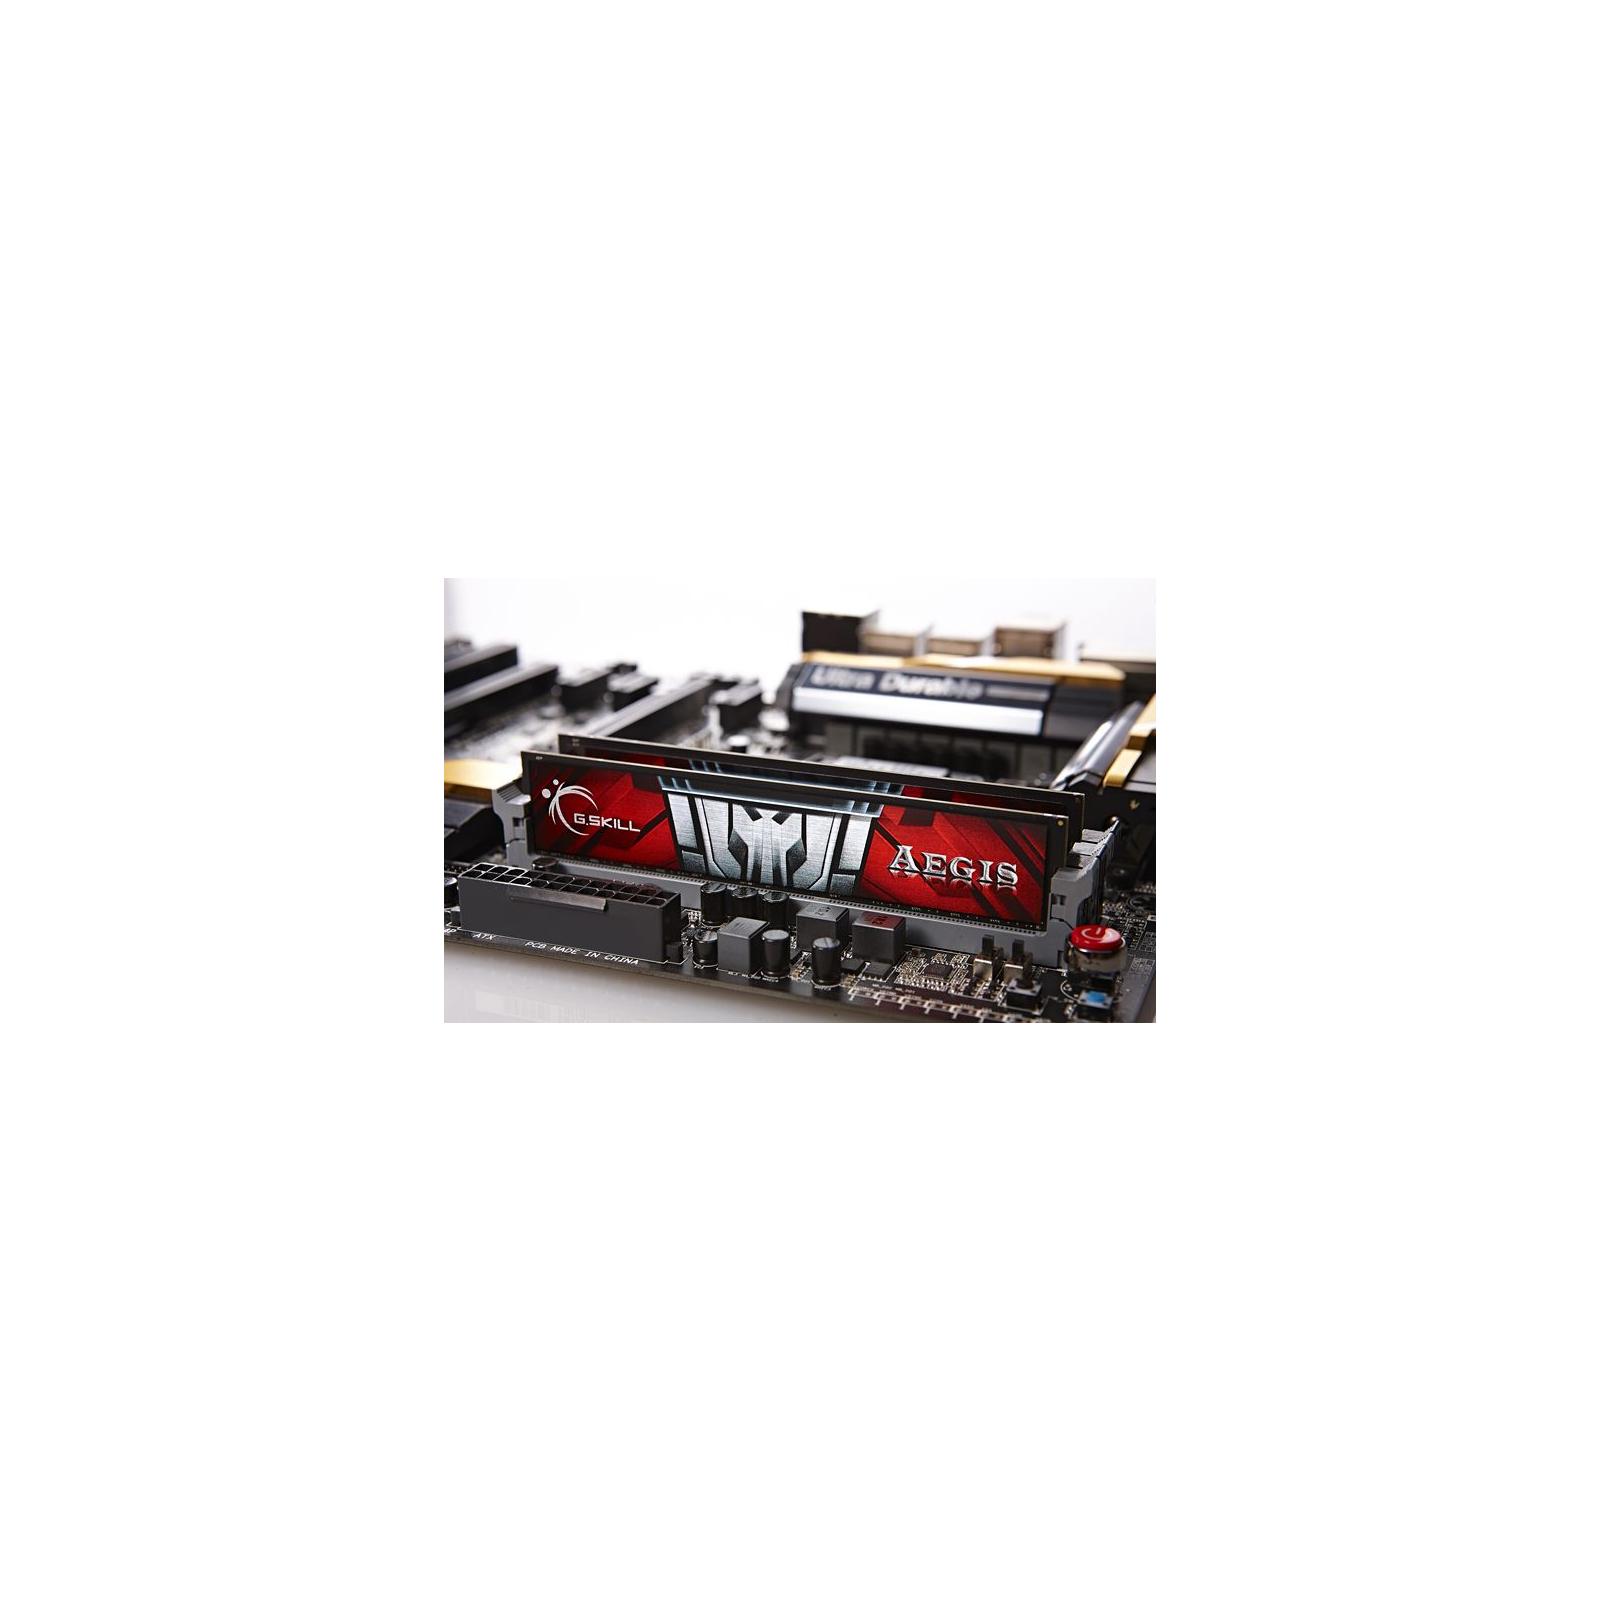 Модуль памяти для компьютера DDR3 4GB 1600 MHz G.Skill (F3-1600C11S-4GIS) изображение 2